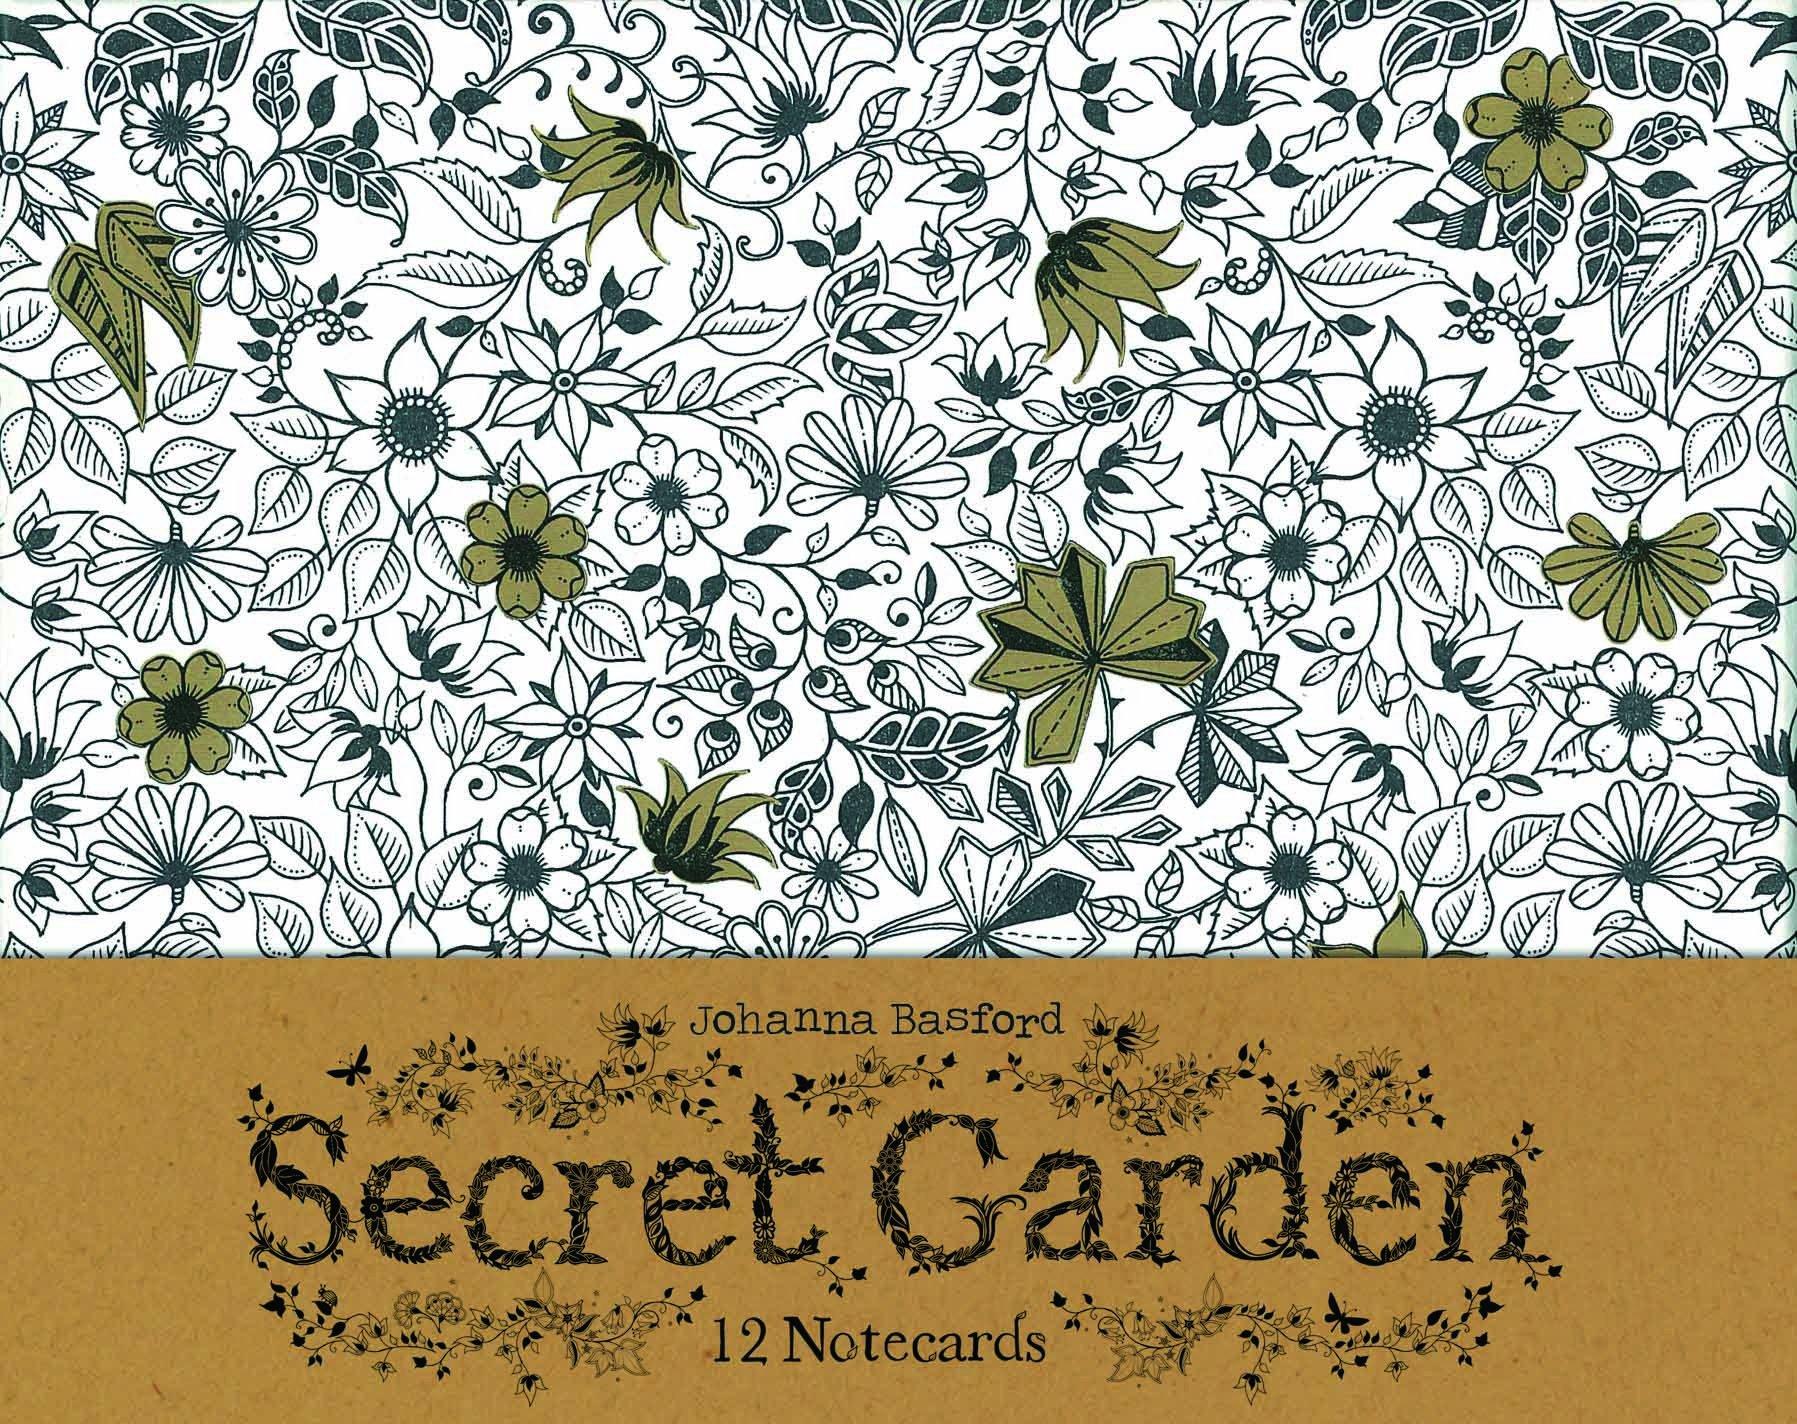 Amazon.com: Secret Garden: 12 Notecards (9781856699471): Johanna ...